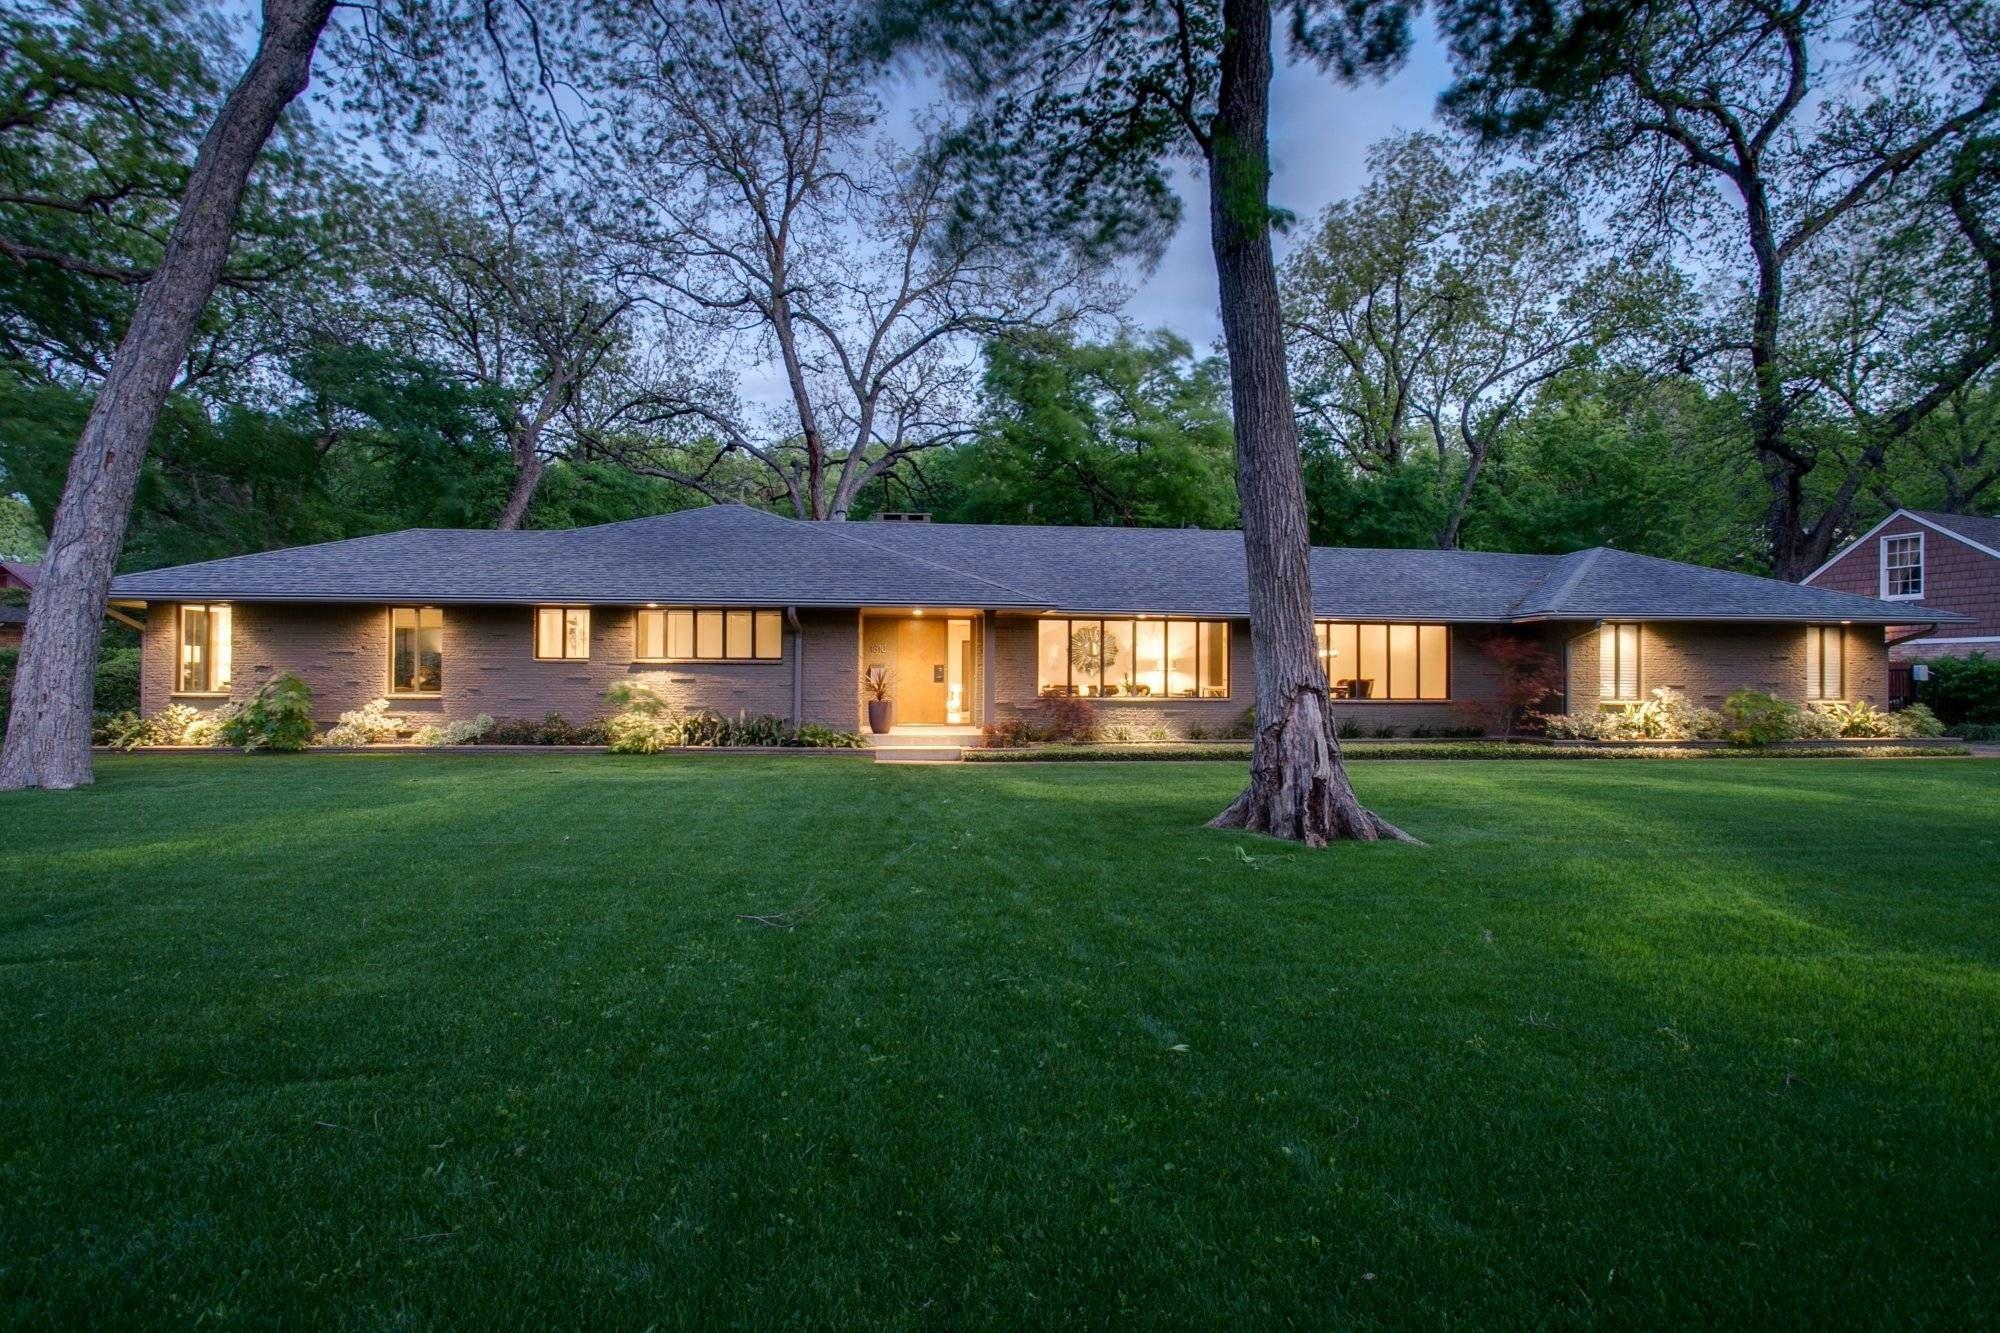 600k Ranch Style Home In Kessler Park Mixes 1950s